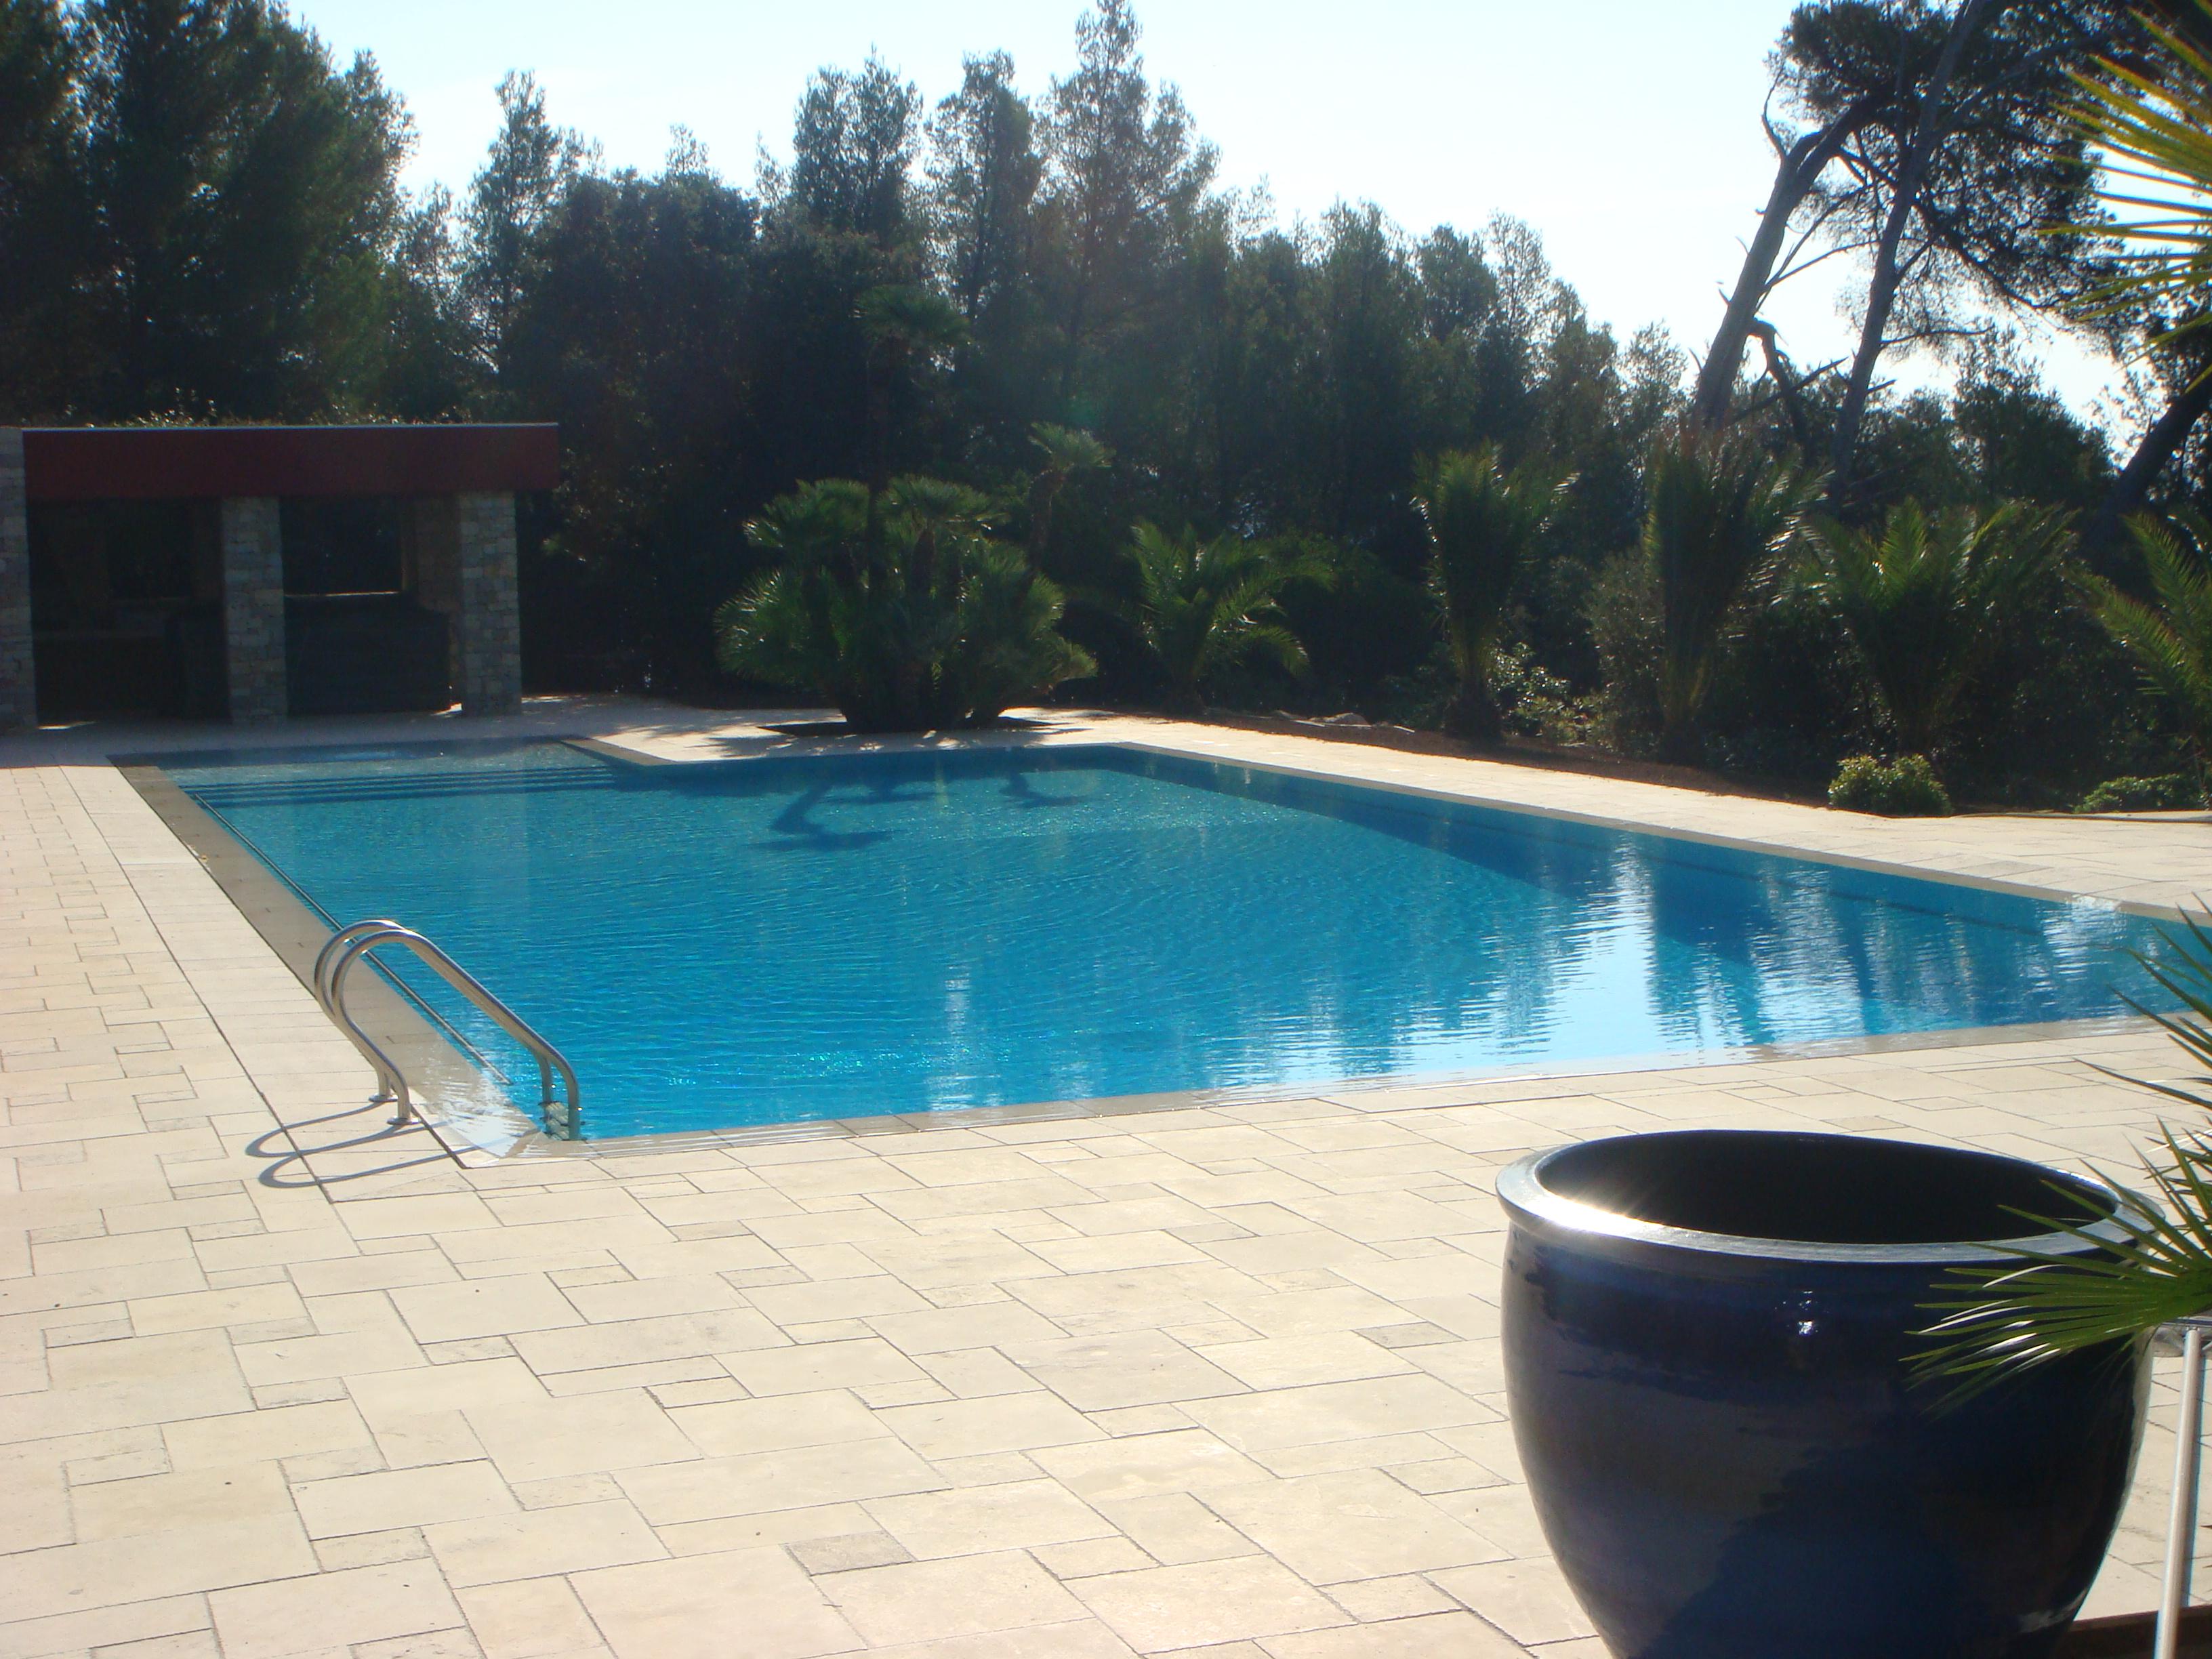 Nettoyage piscine entretien de votre piscine with for Entretien de piscine